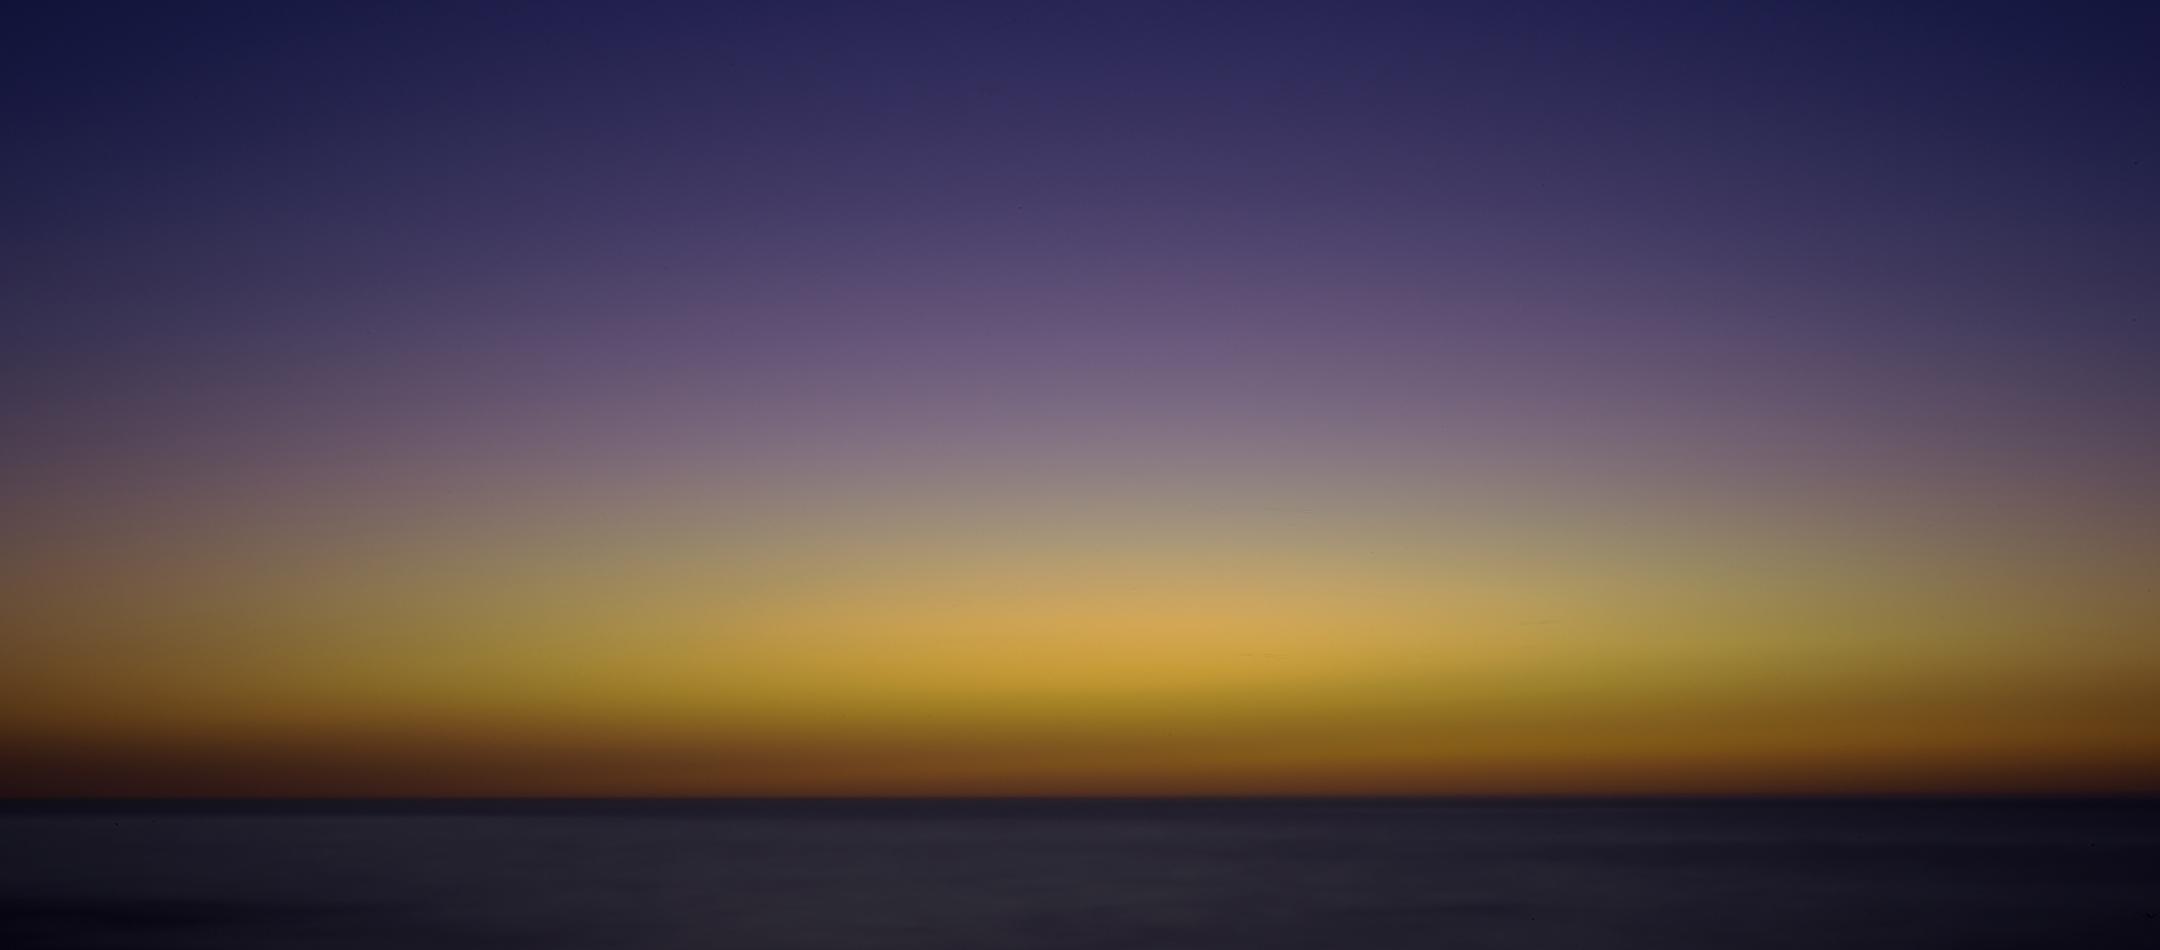 The Pervasive Veil of Atmosphere